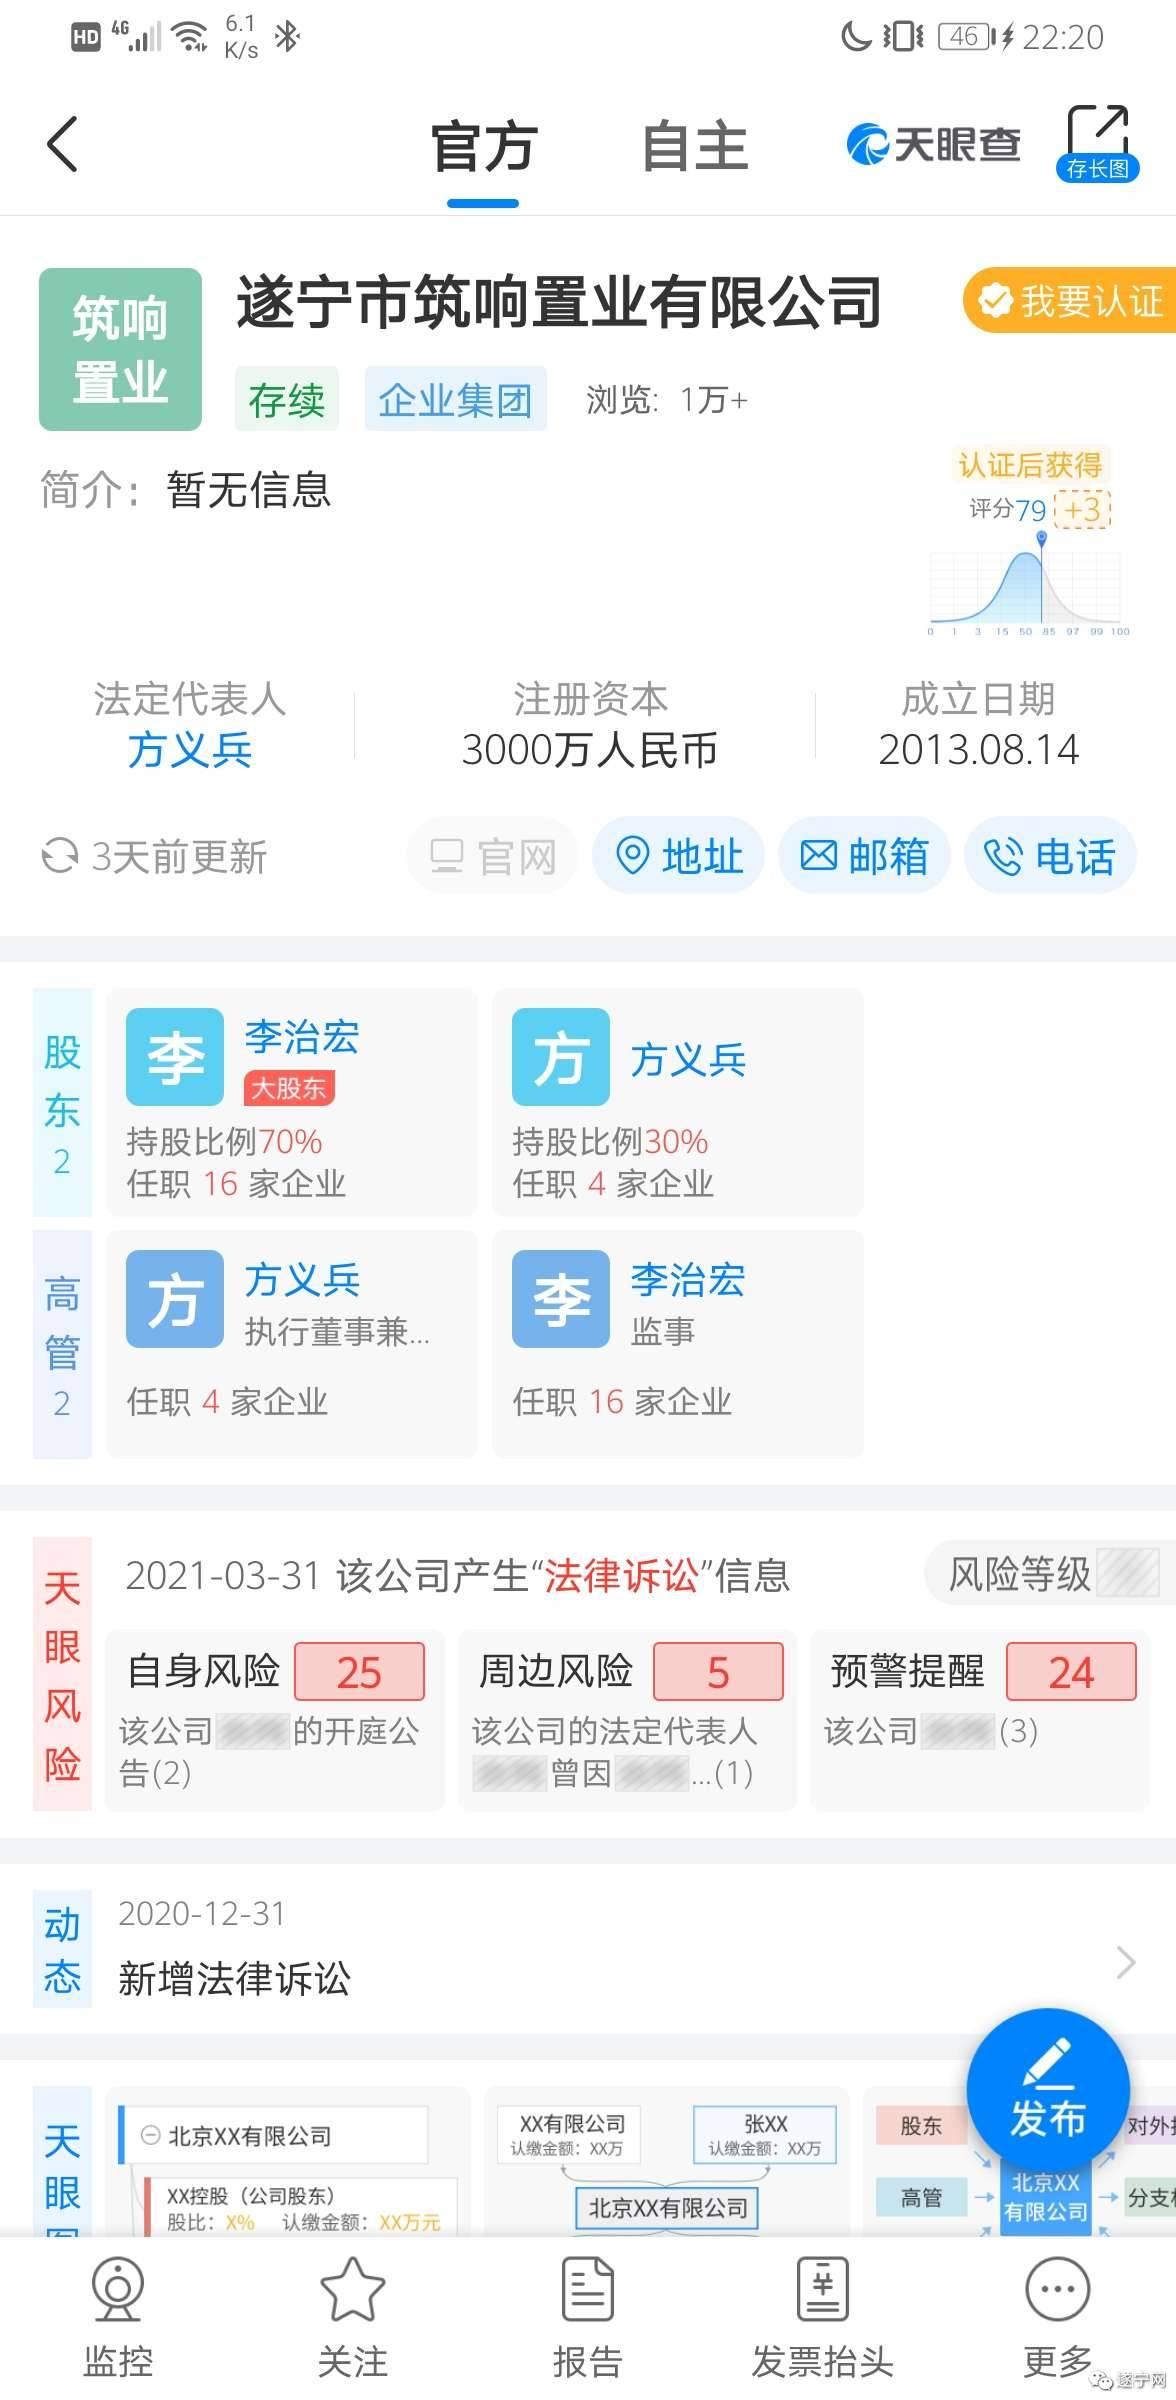 Screenshot_20210420_222030_com.tianyancha.skyeye.jpg